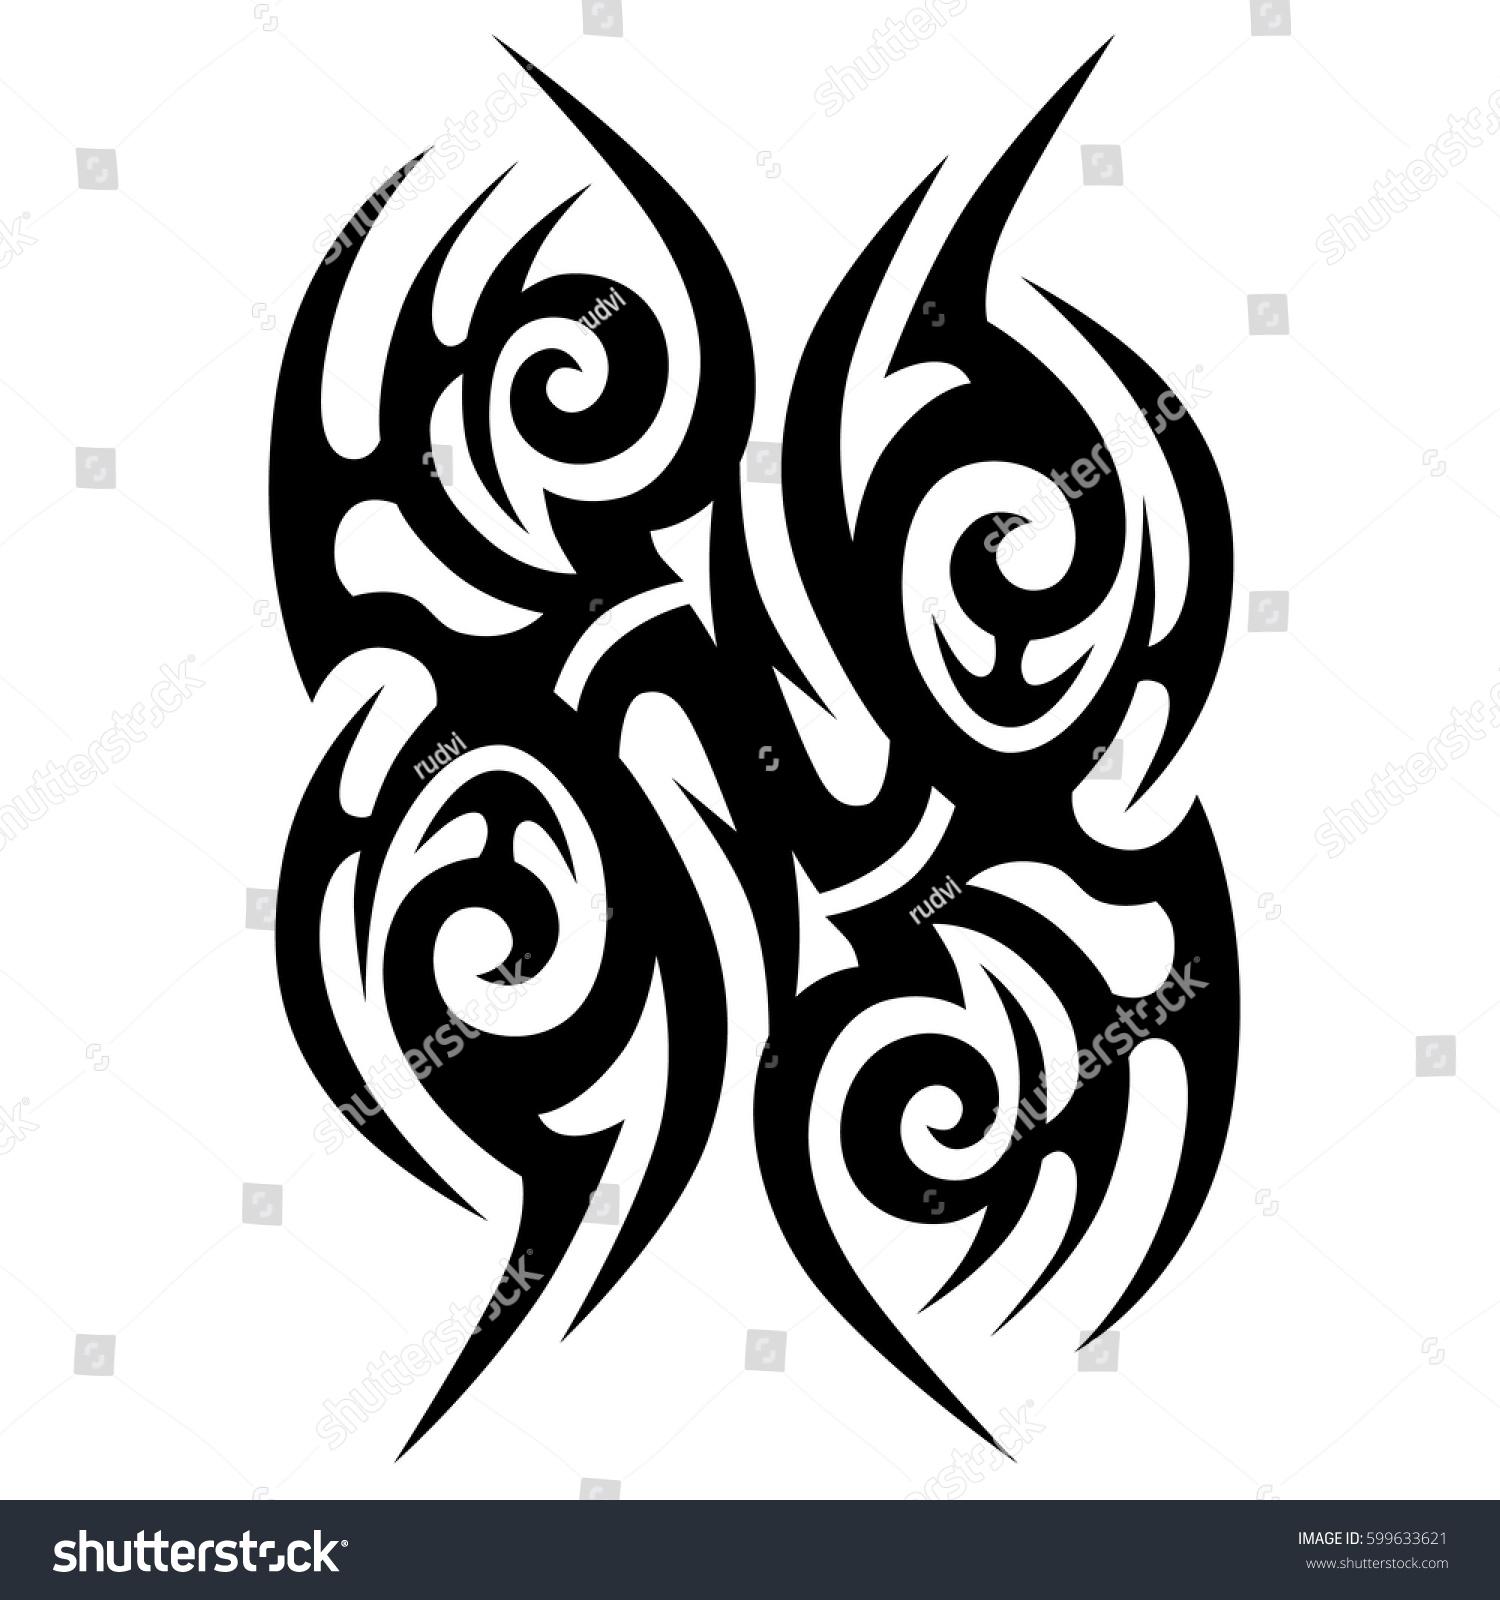 Vector Tribal Tattoo Designs Tribal Tattoos Stock Vector